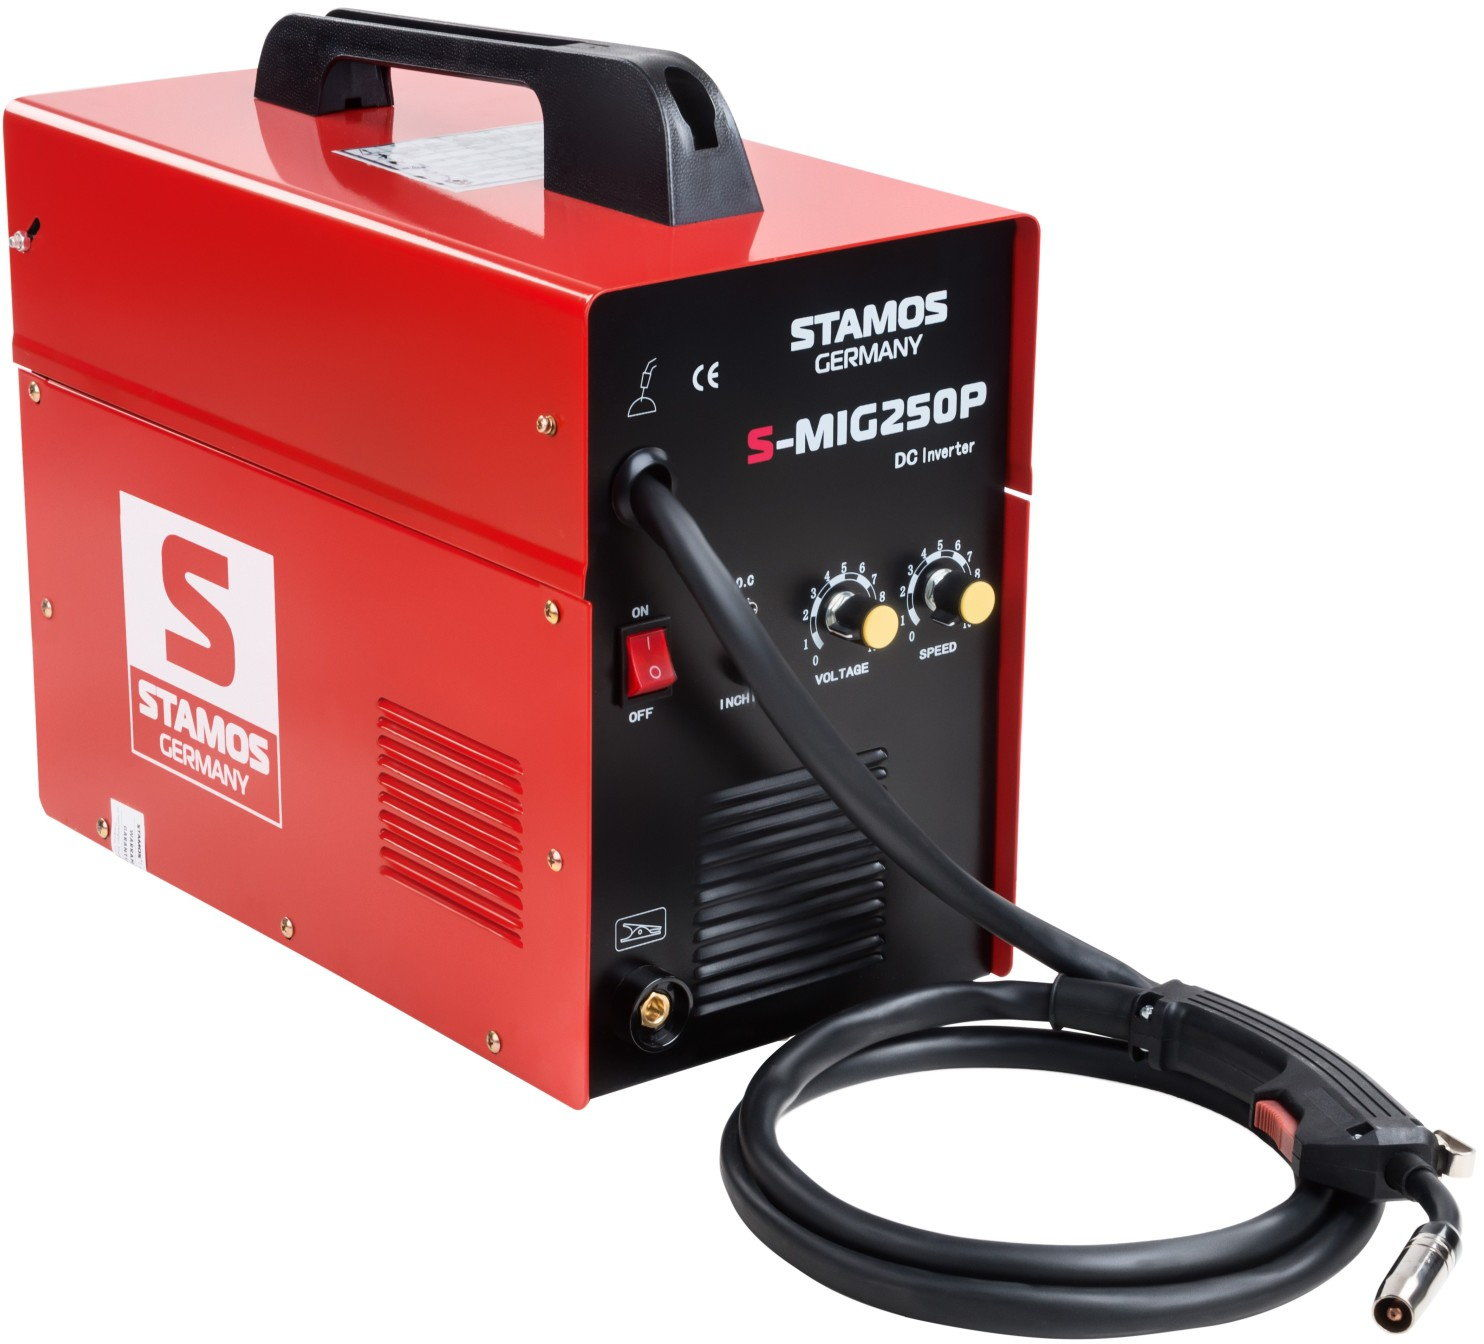 Spawarka MIG/MAG - 250 A - 230 V - przenośna - PLUS maska spawalnicza - Firestarter 500 - Advanced - Stamos Basic - S-MIG 250P - 3 lata